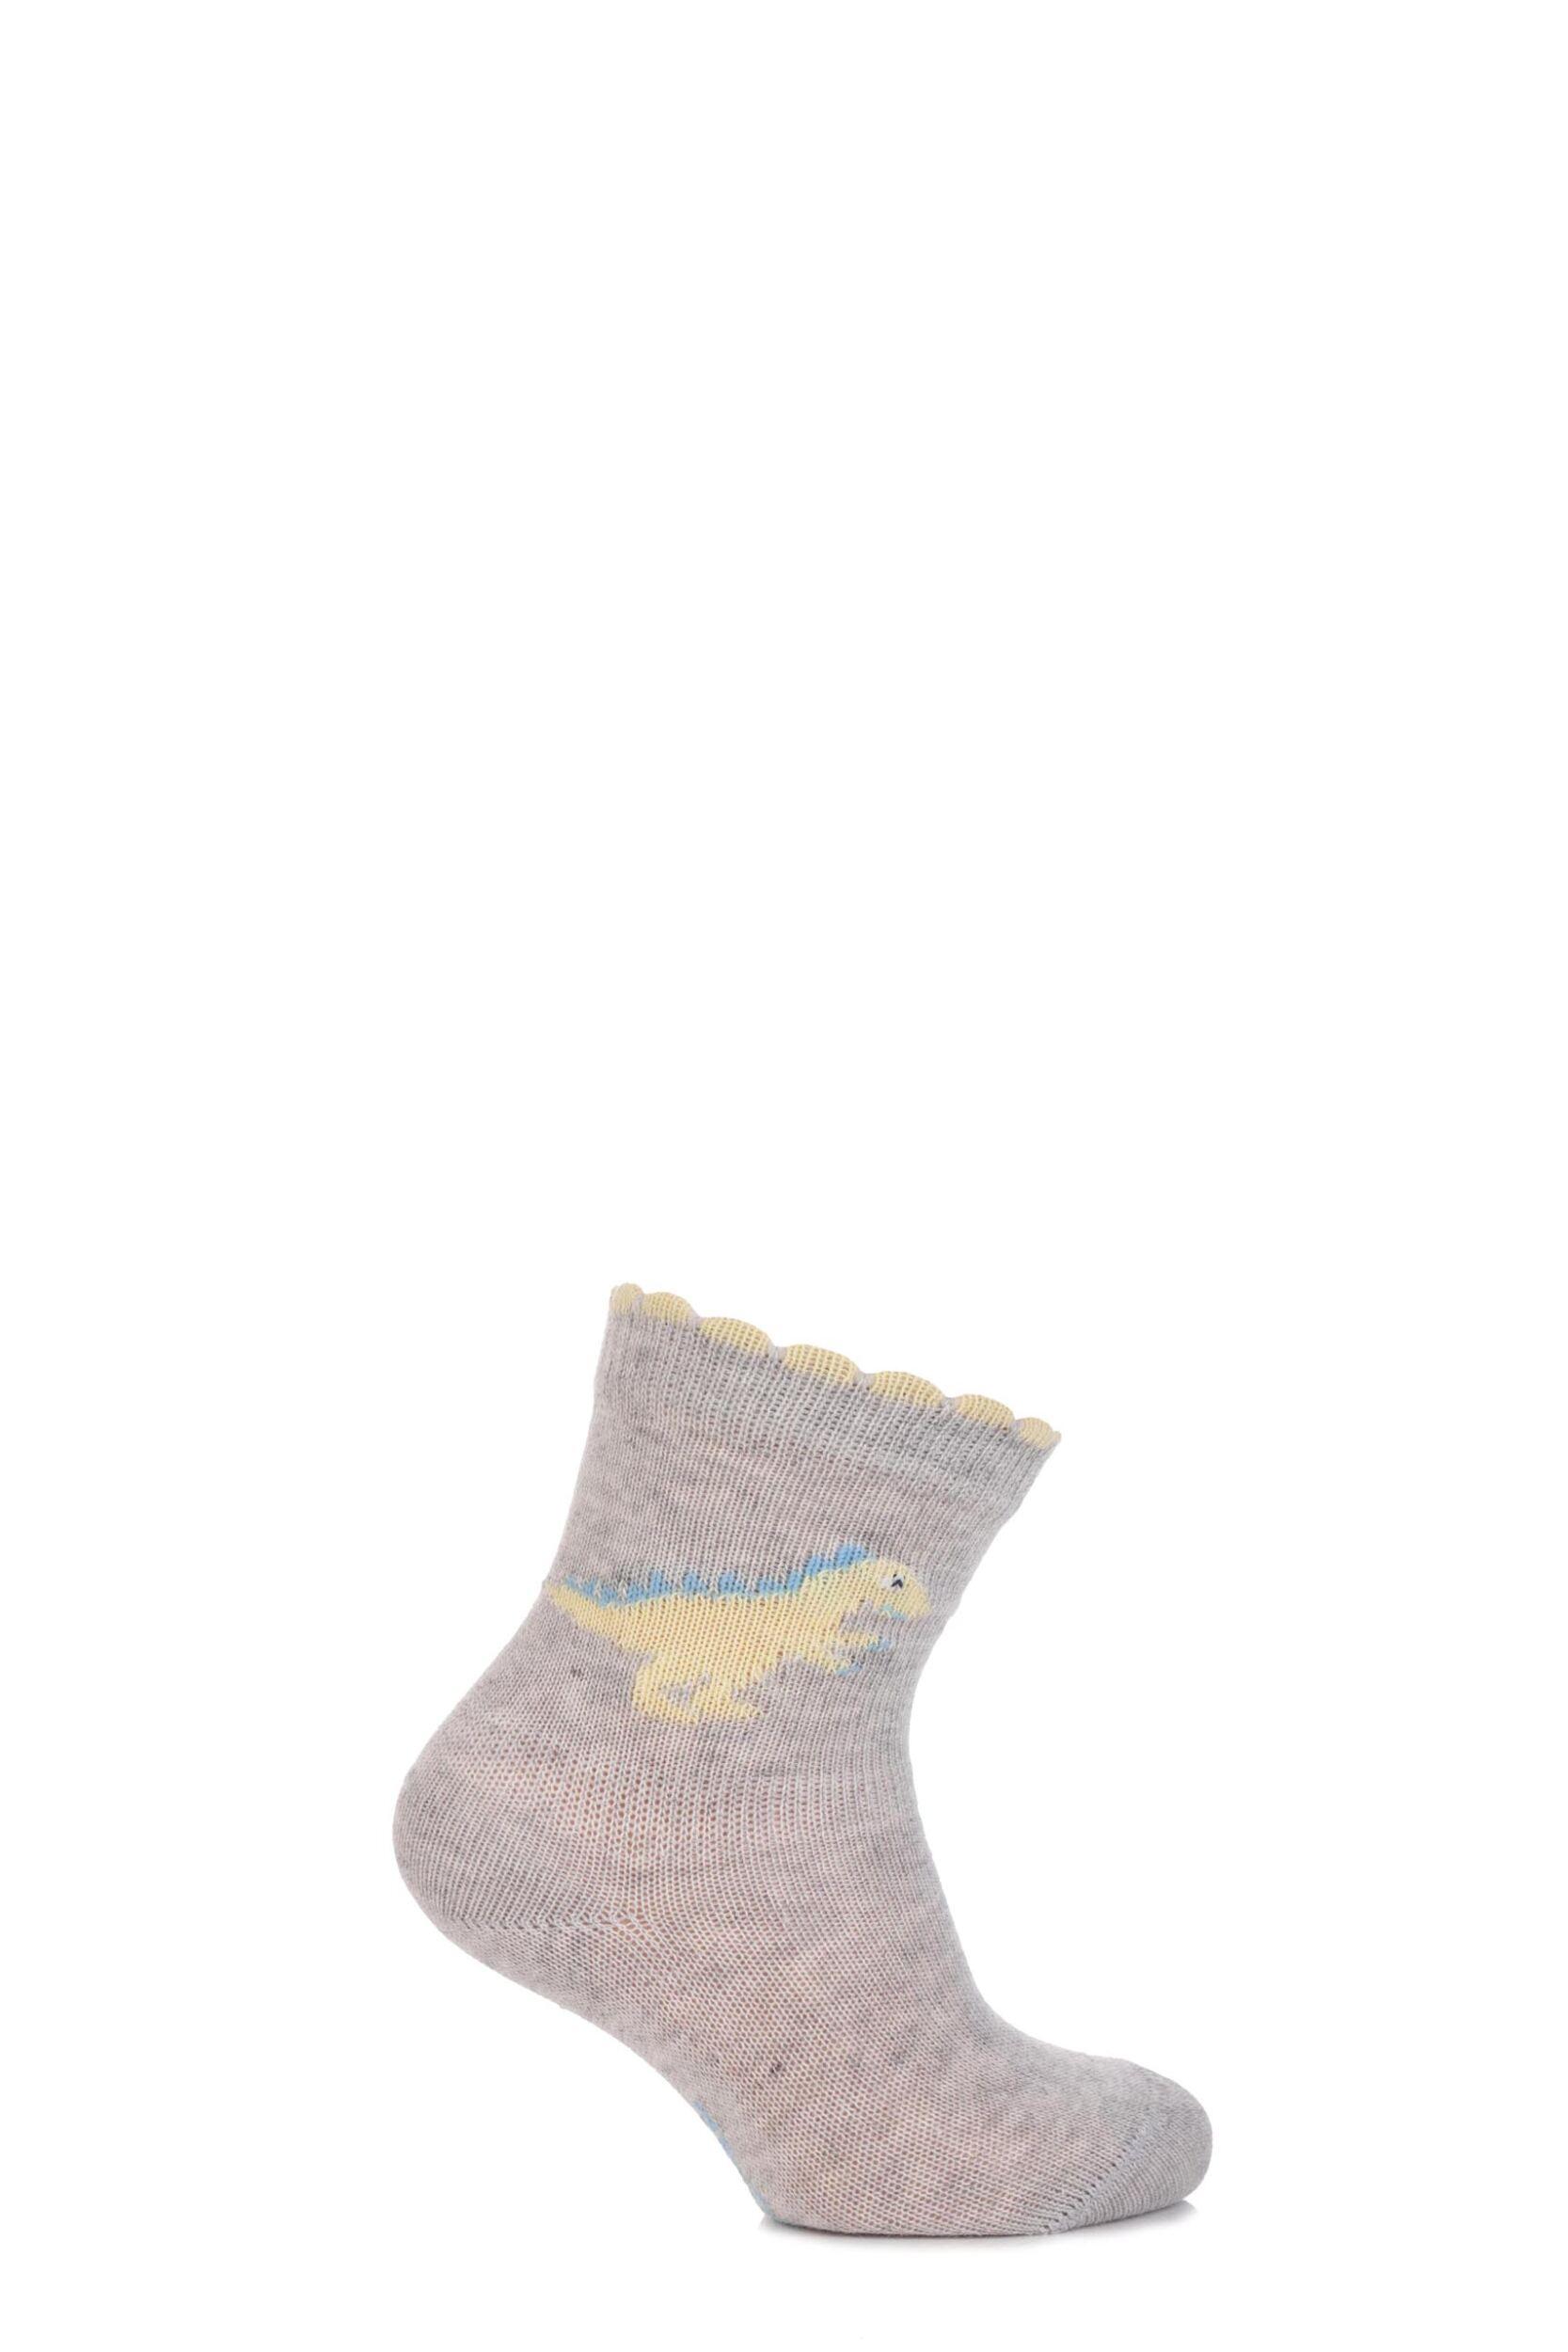 Image of Babies 1 Pair Falke Dinosaur Cotton Socks